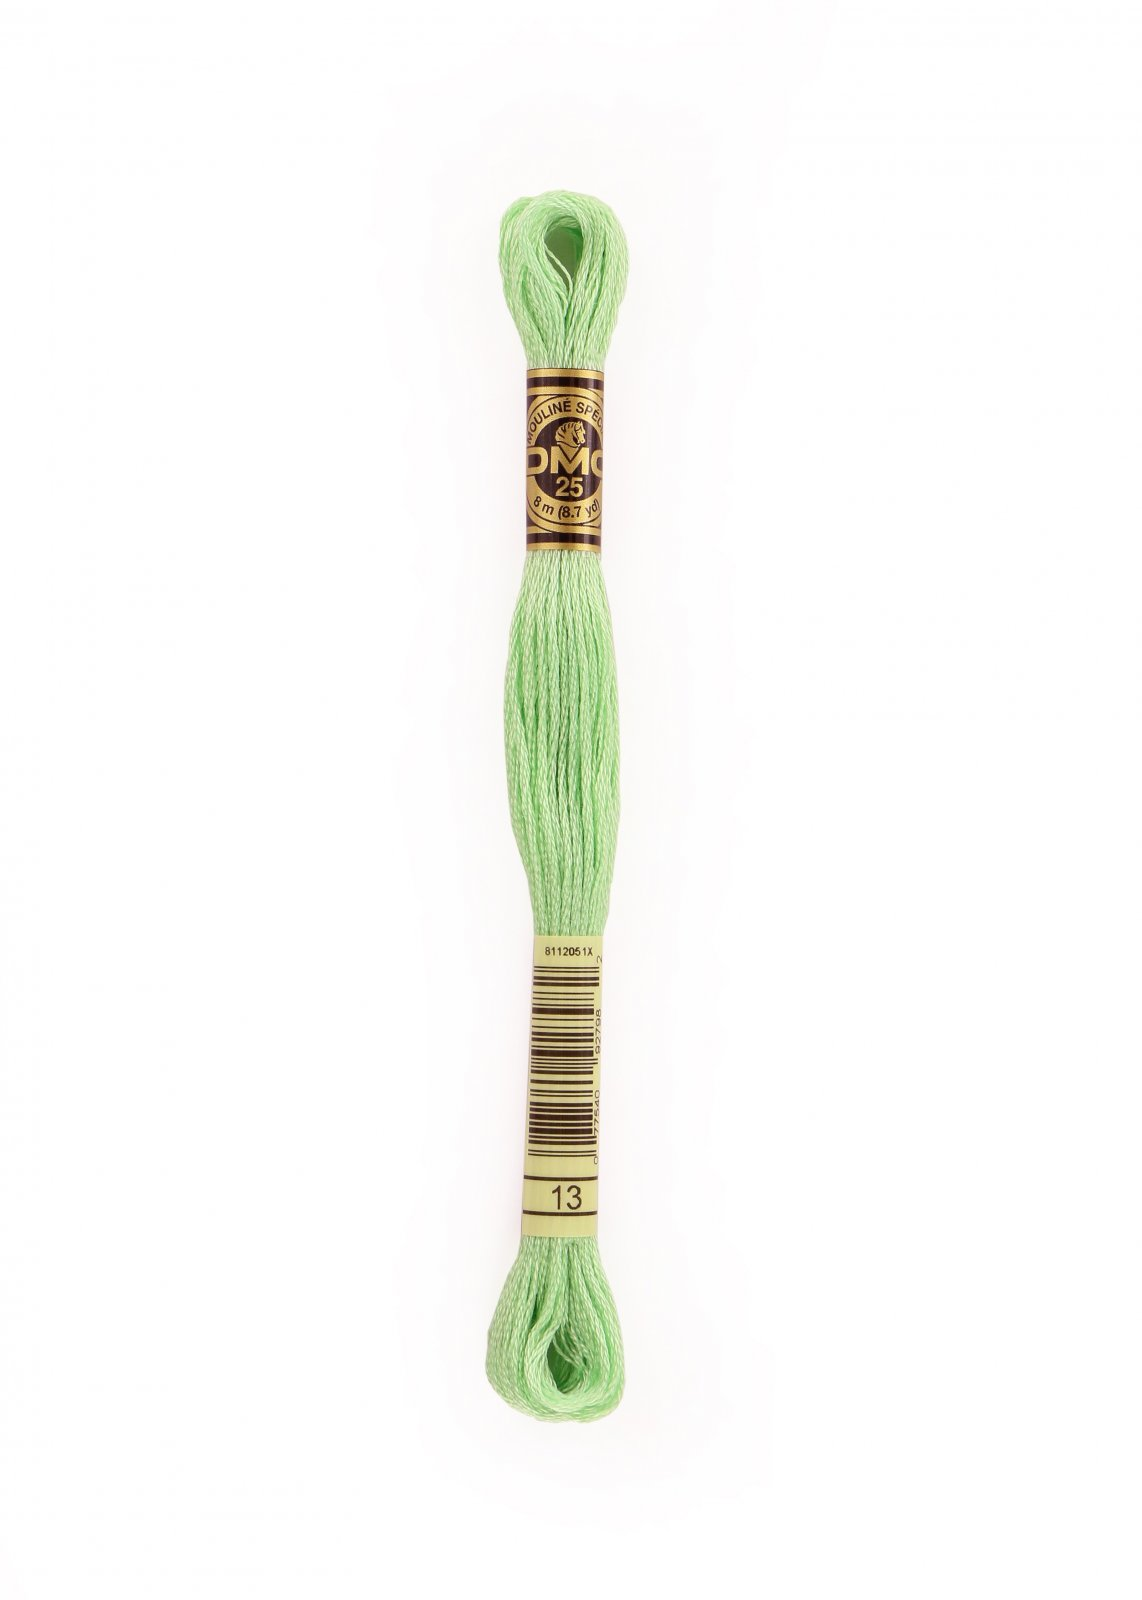 6 Strand Cotton Floss Sz 25 8.7yds - Medium Light Nile Green